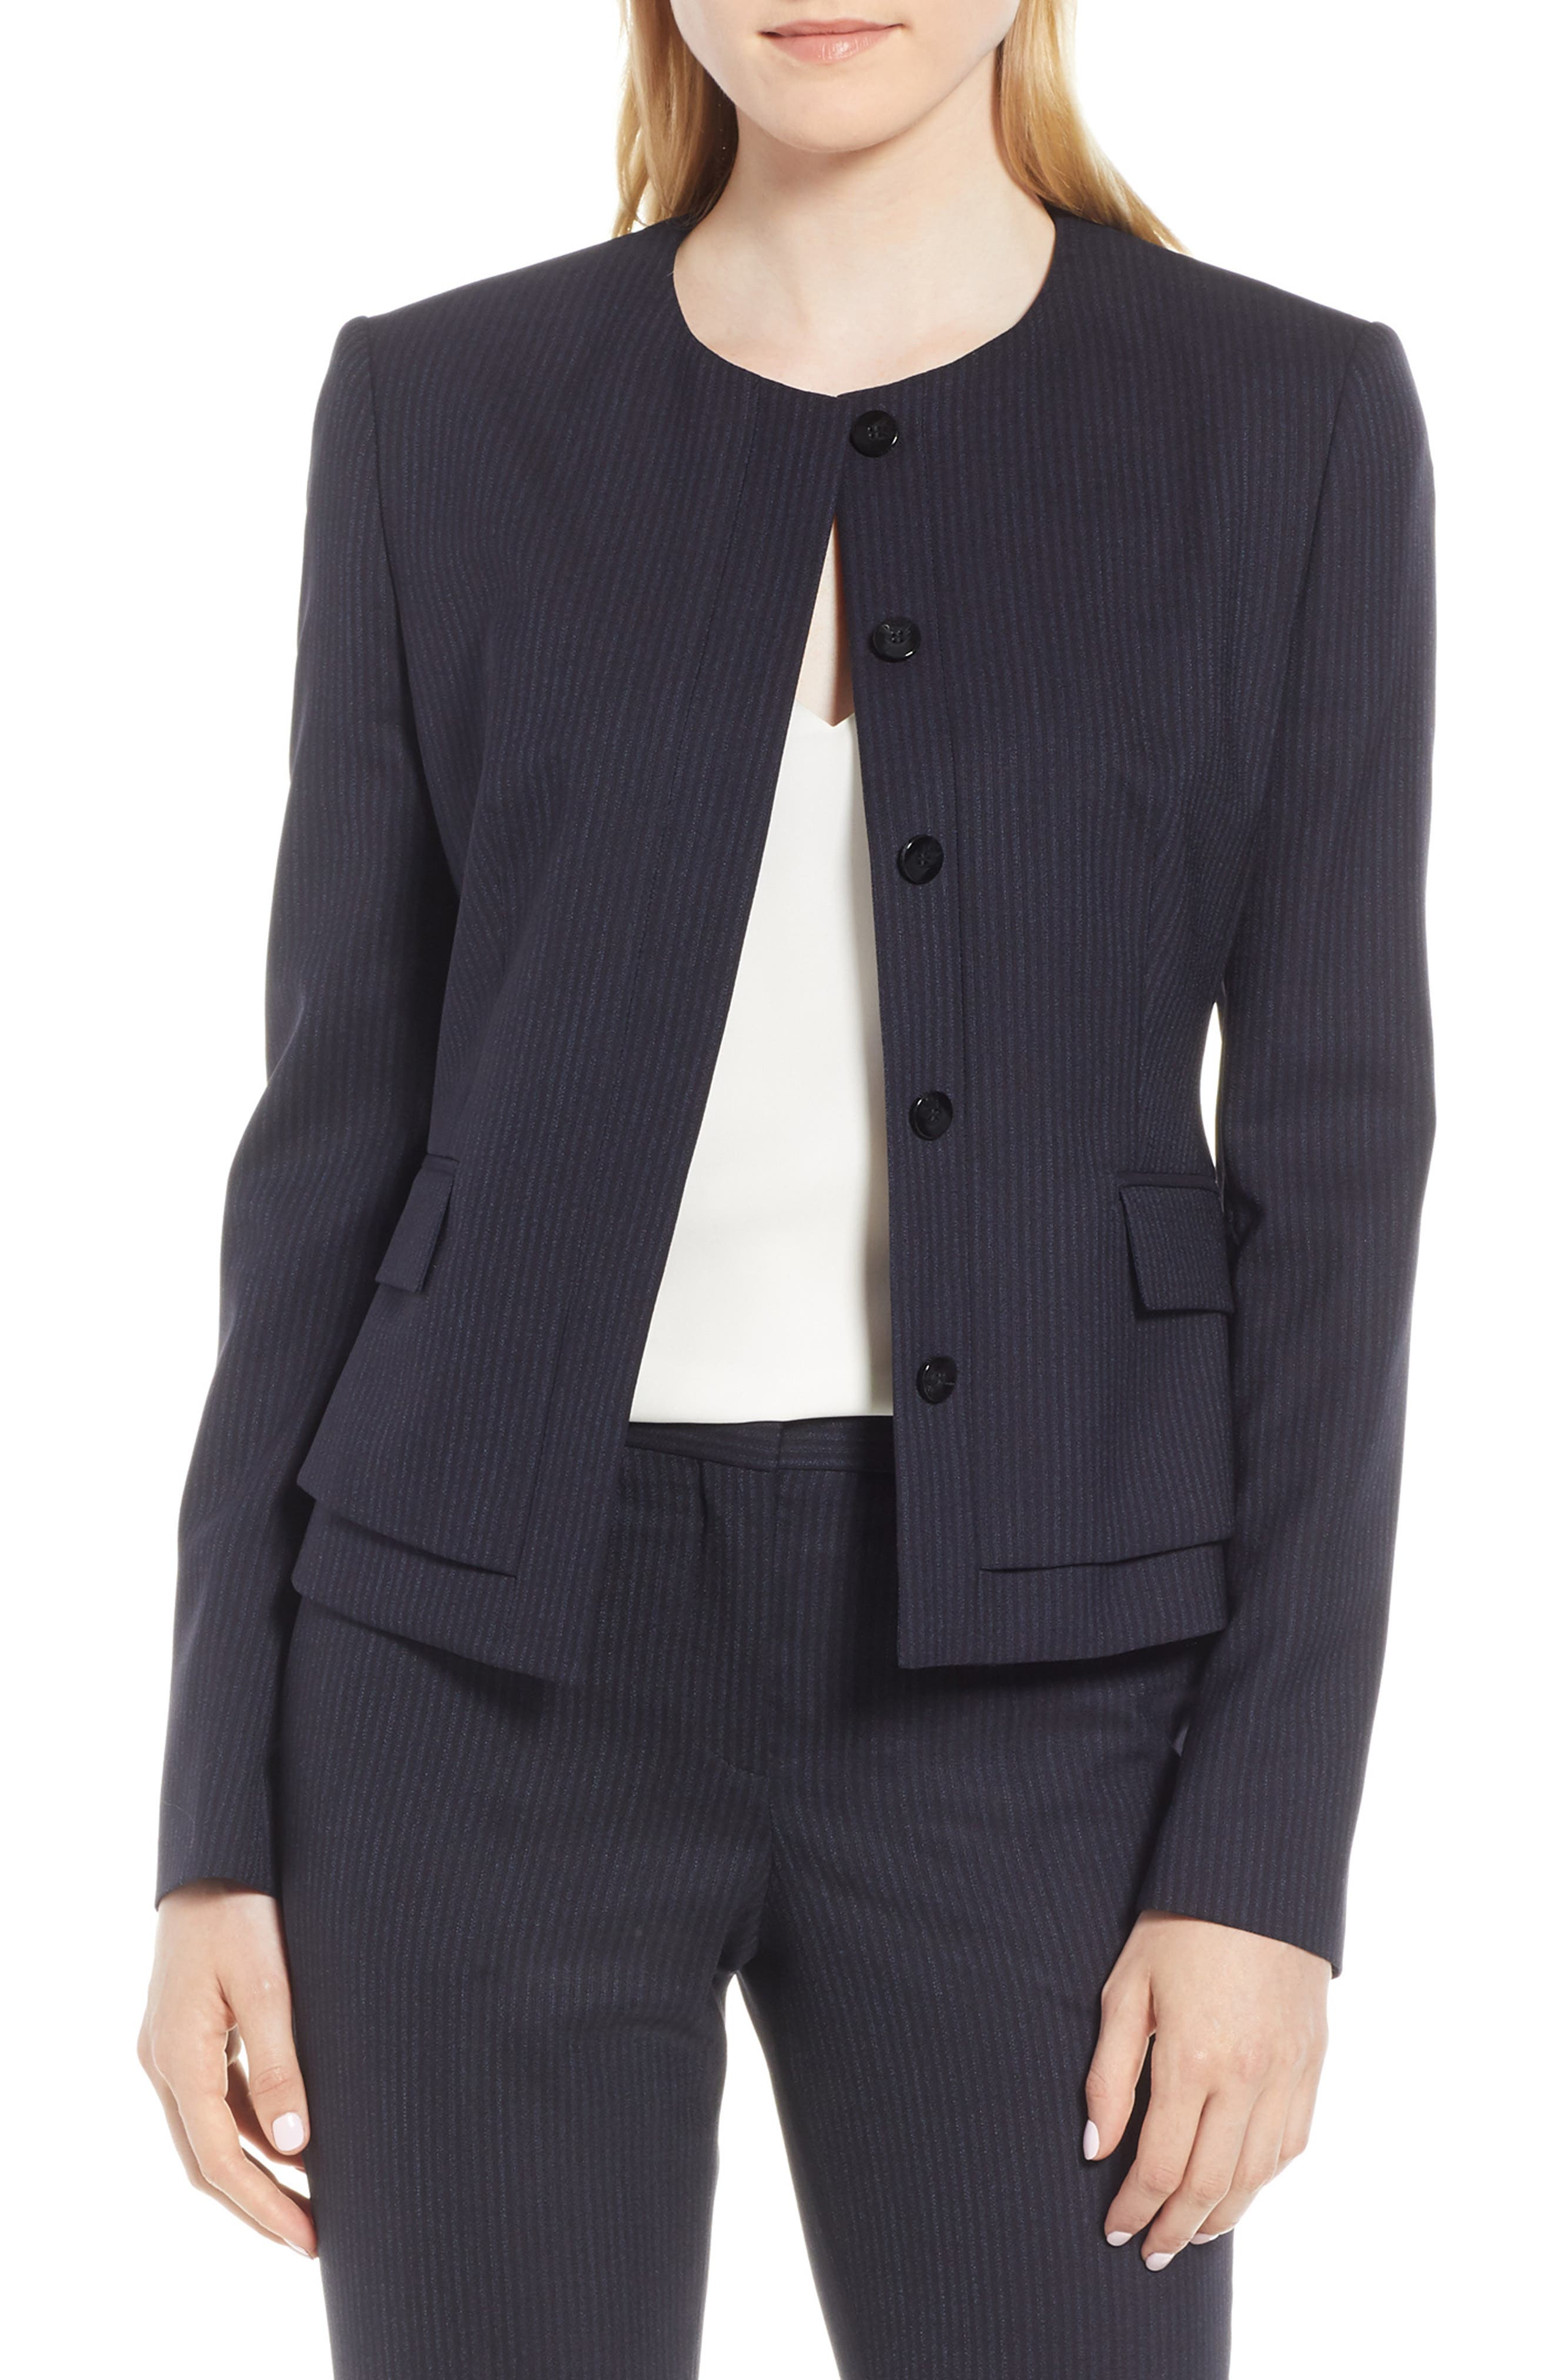 Jasyma Tonal Stripe Stretch Wool Suit Jacket,                         Main,                         color, NAVY FANTASY